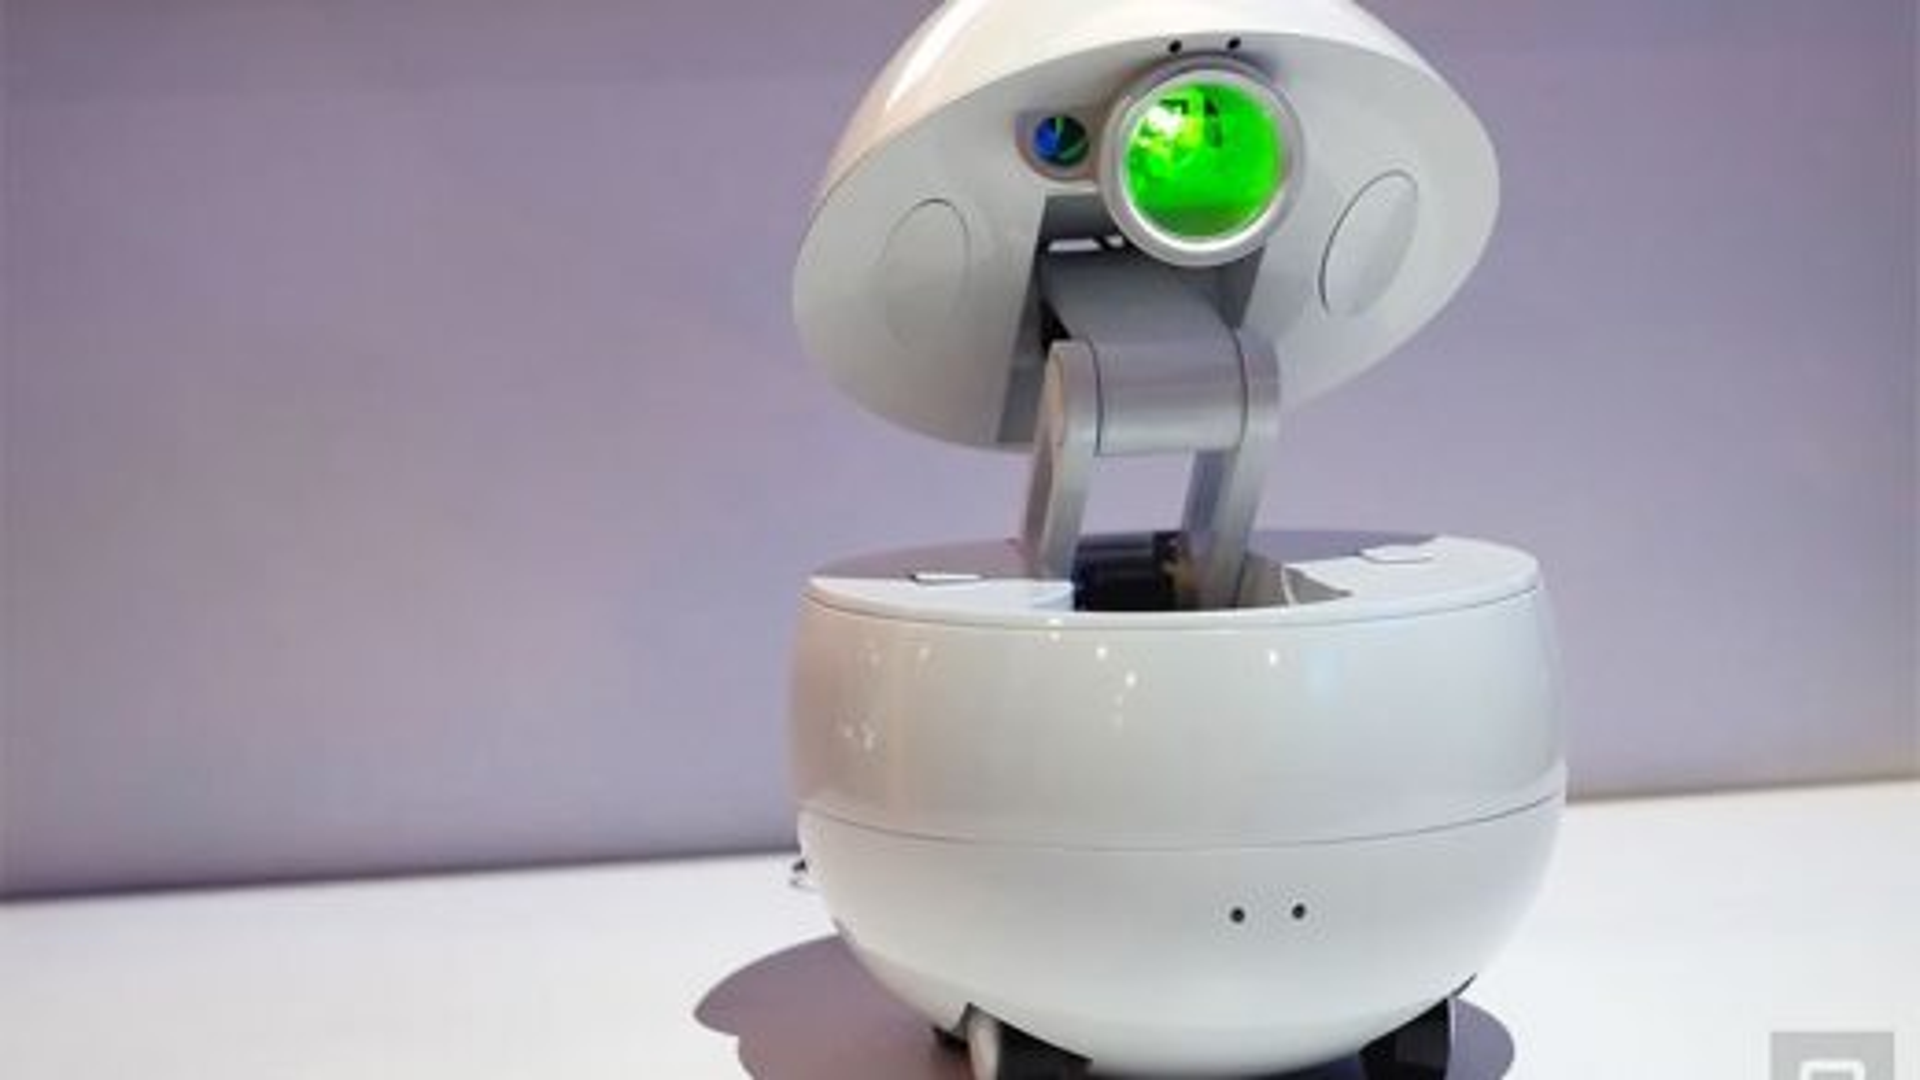 ربات پاناسونیک | تگ